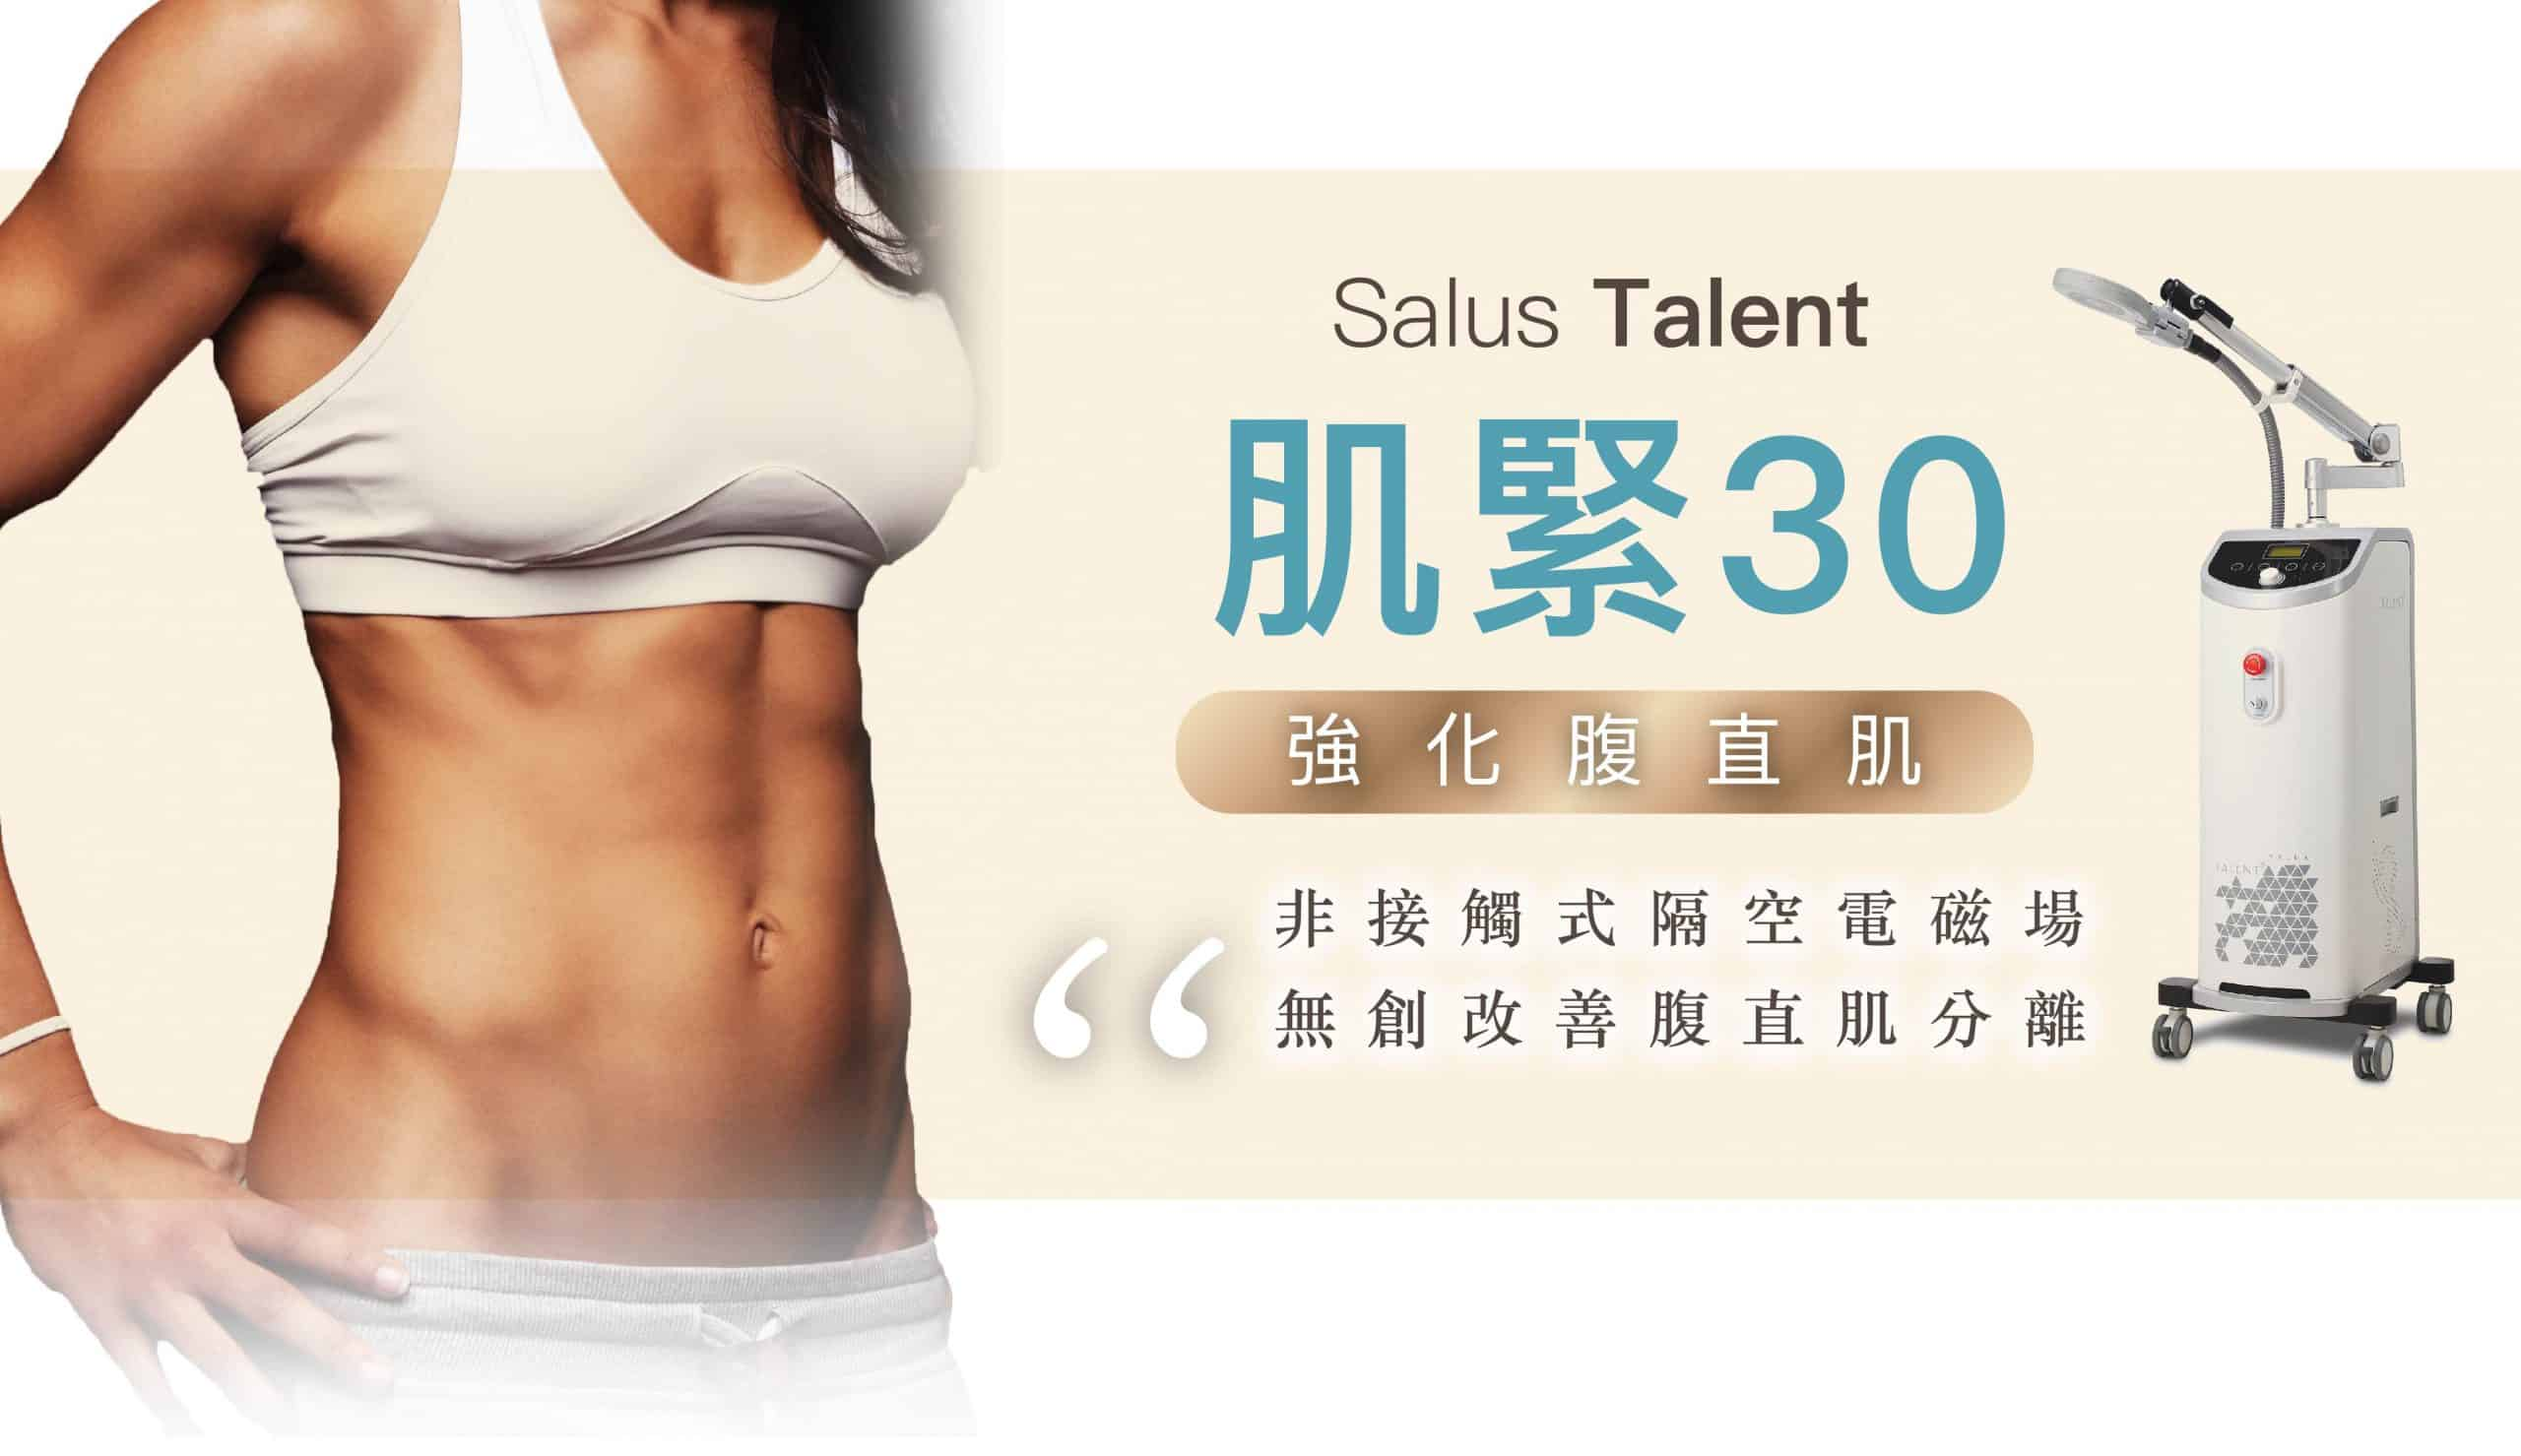 Salus talent Salus Talent PtoP 03 scaled